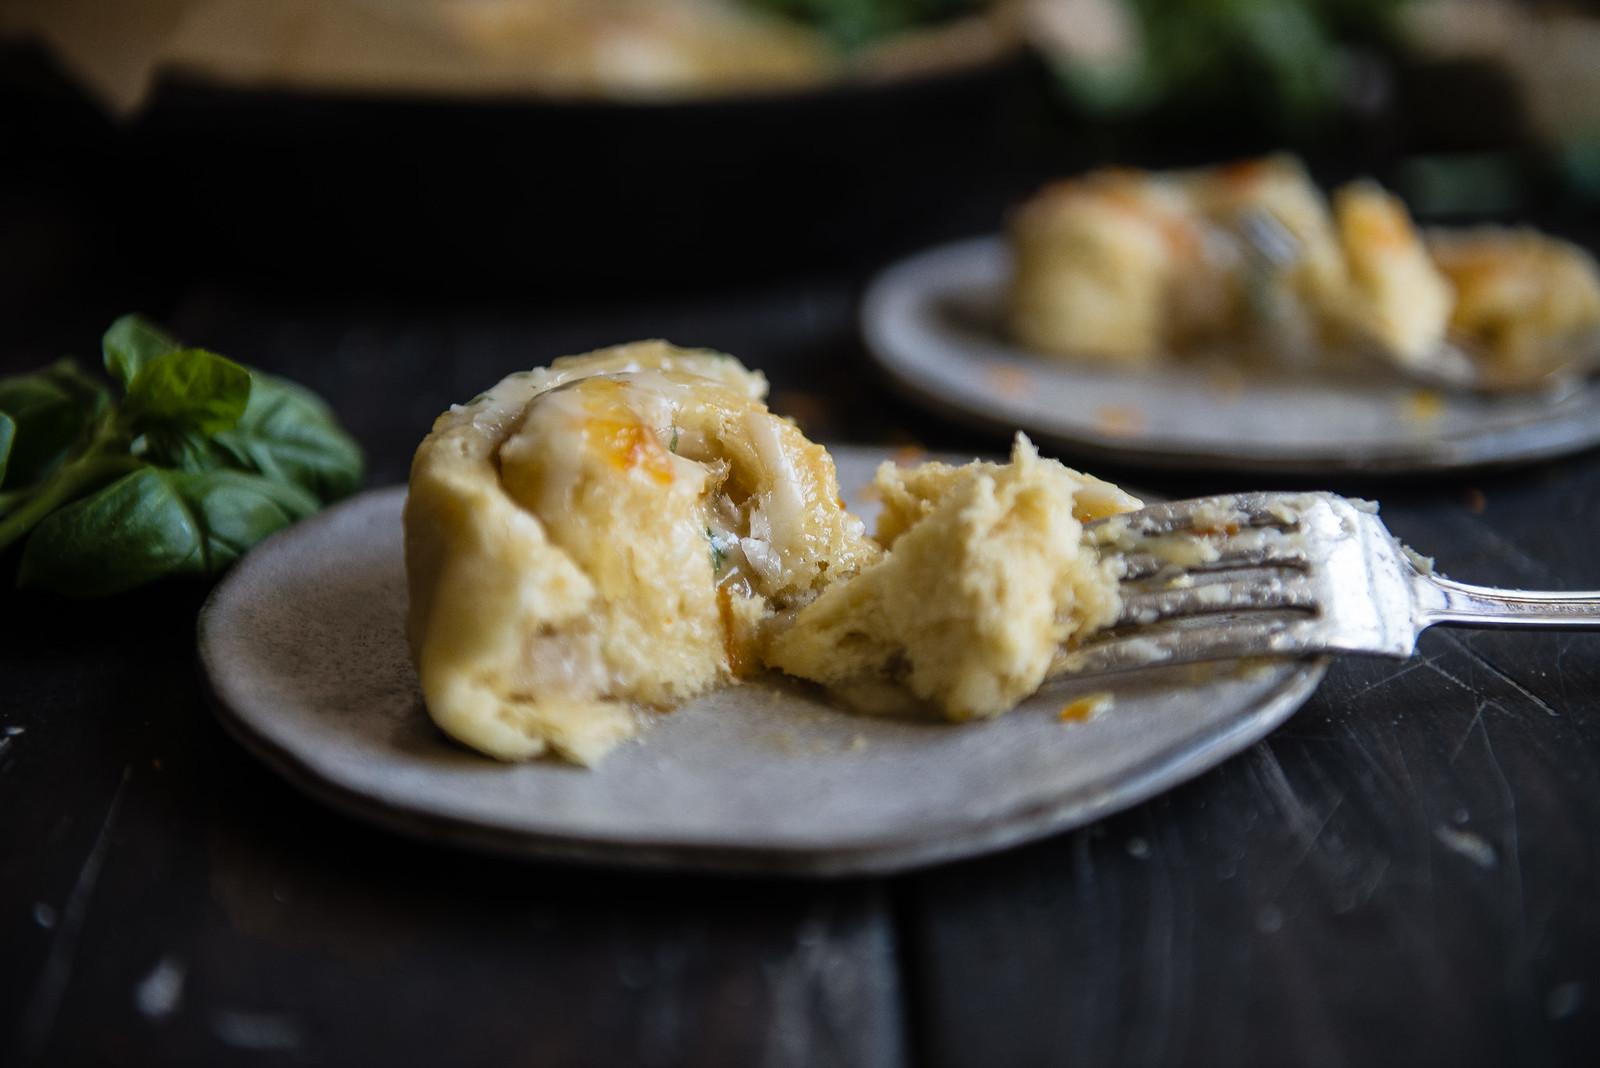 orange-almond sweet rolls with basil glaze | two red bowls